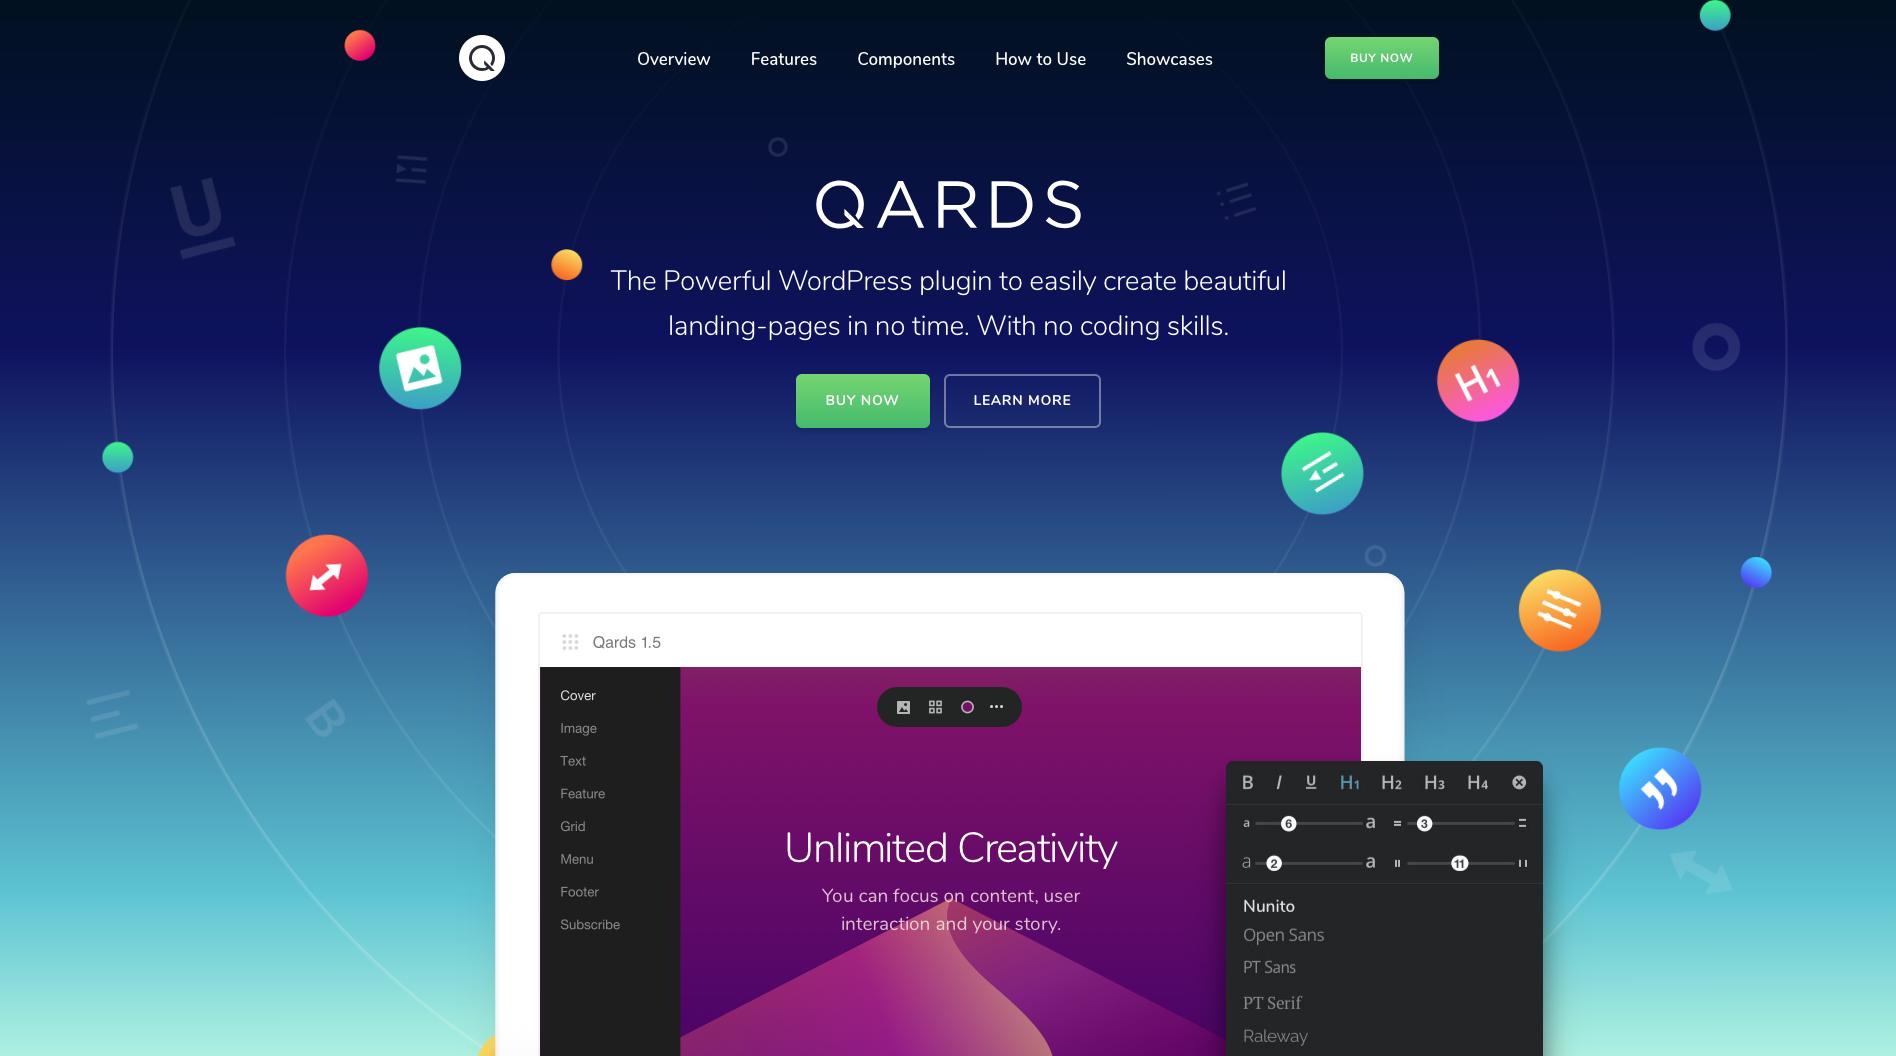 UI Design Trends: QARDS Gradient Homepage